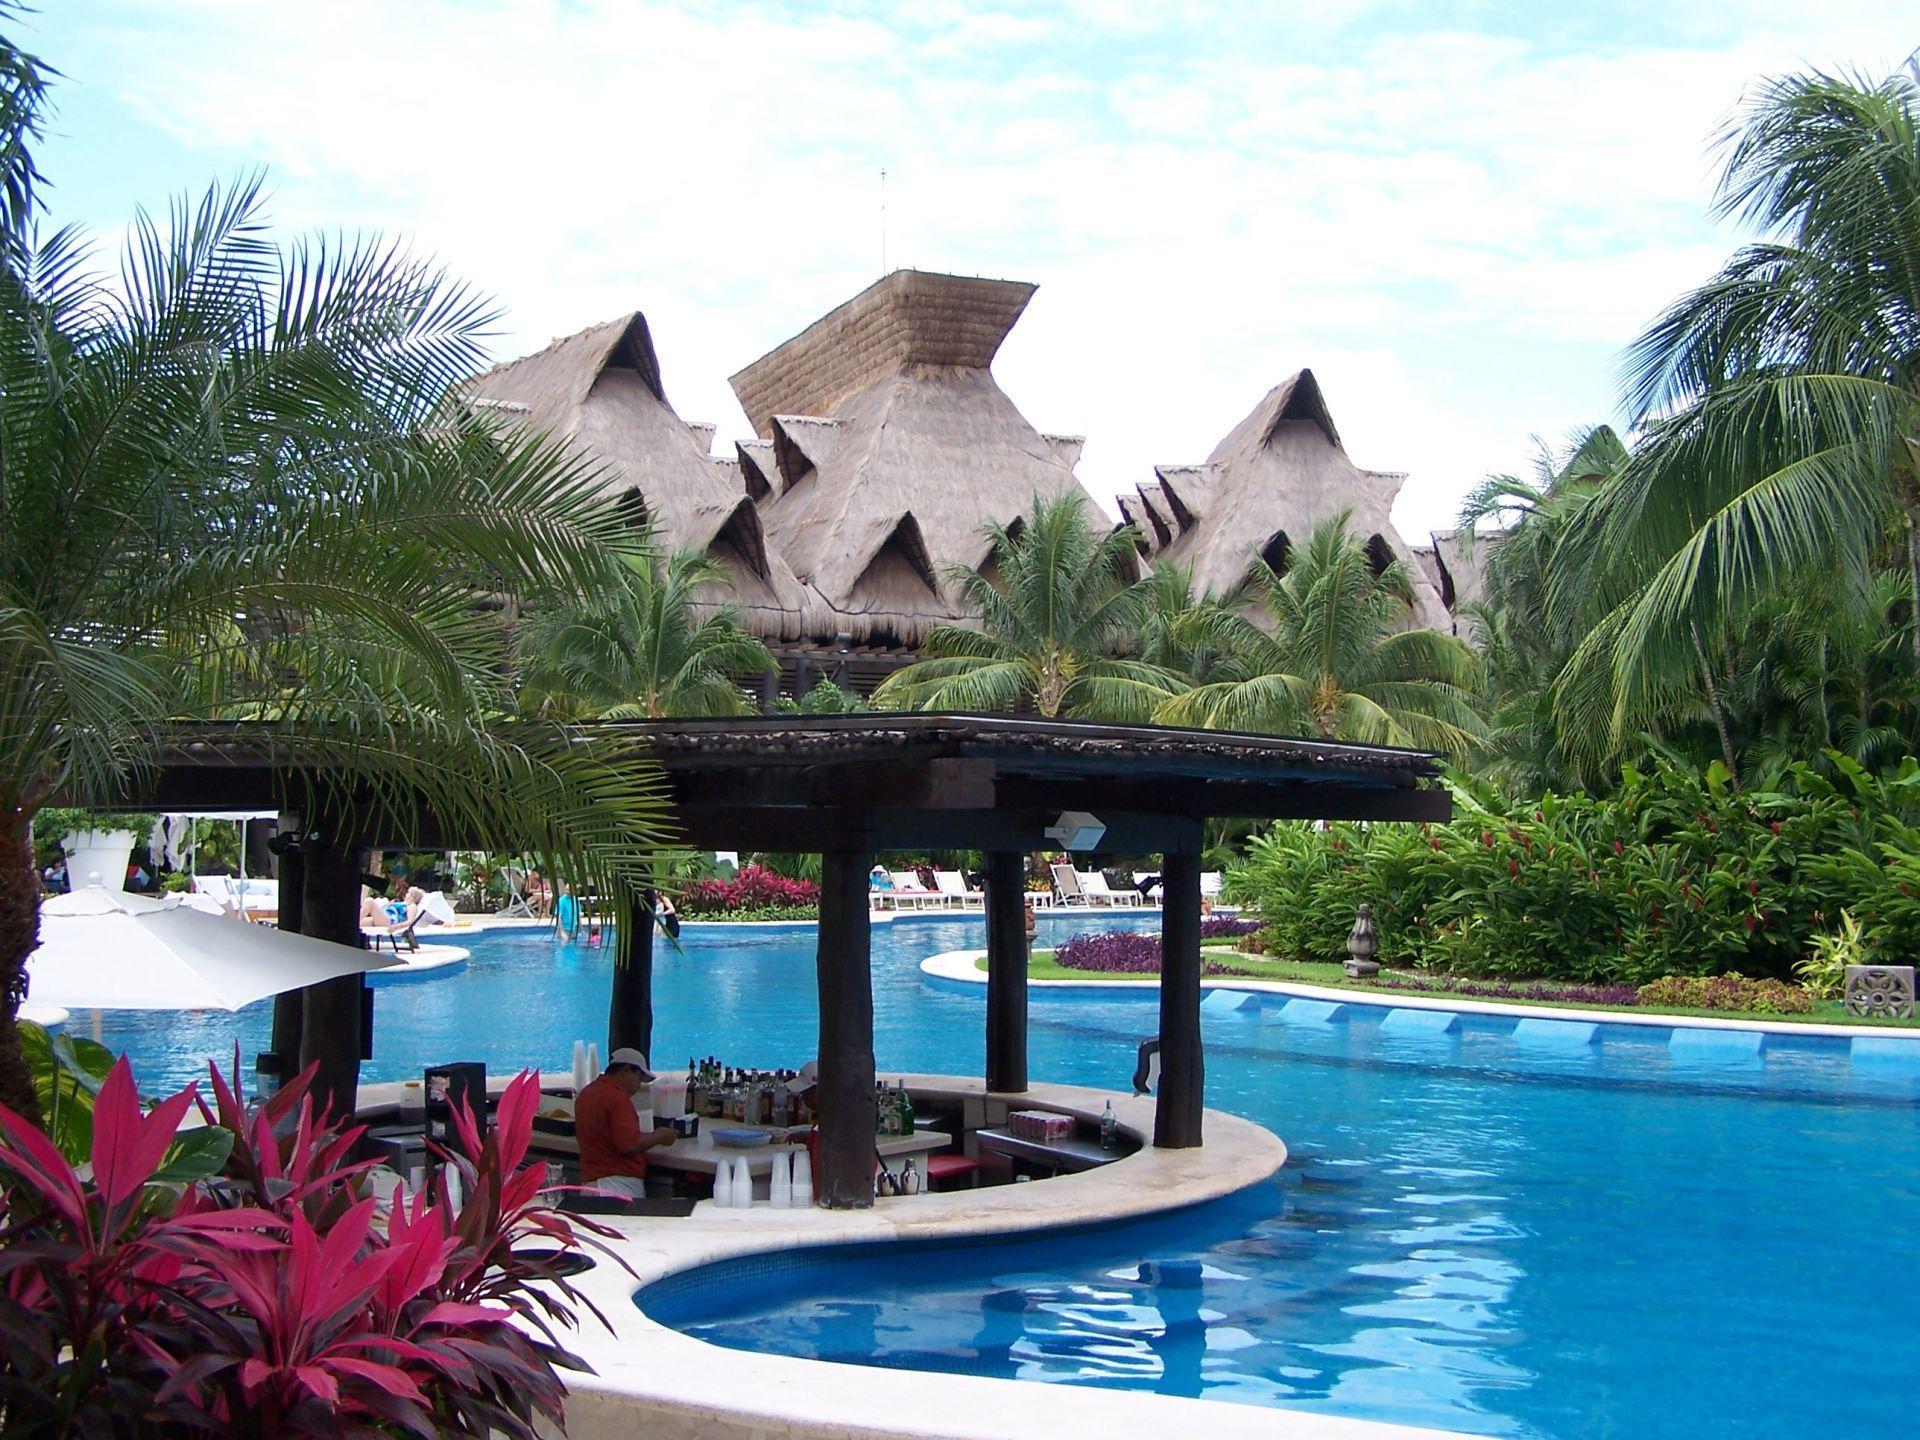 Top Five New Resorts and Attractions in Cancun / Riviera ... |Mayan Palace Riviera Maya Cancun Rooms